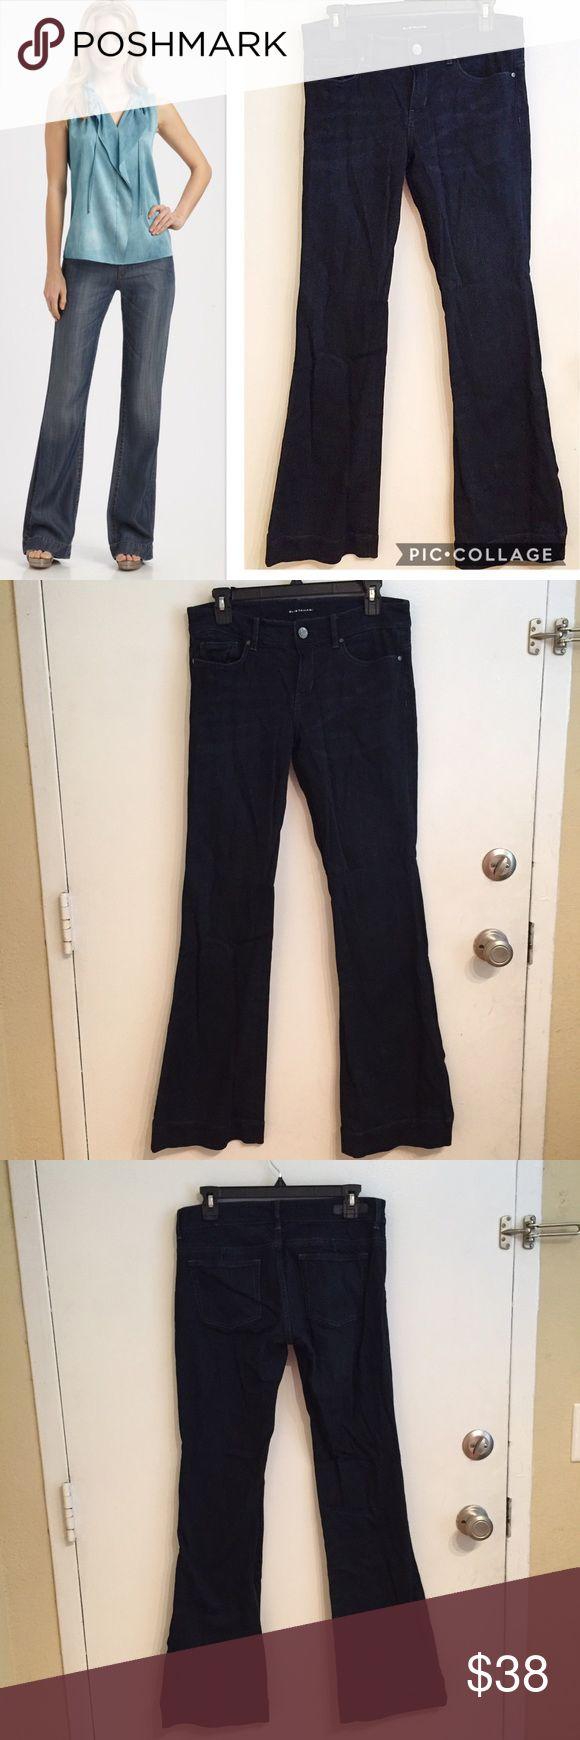 "Elie Tahari Adena Flare Leg Jeans Elie Tahari ""adena"" Flare leg jeans. Size 6. Dark wash. Measures 15.5"" flat at the waist, 33"" inseam, and 10.5"" leg opening. They do have stretch. #elietahari #adena #flare #jeans #denim #darkwash #basic #staple #punkydoodle  No modeling Smoke free home I do discount bundles Elie Tahari Jeans Flare & Wide Leg"